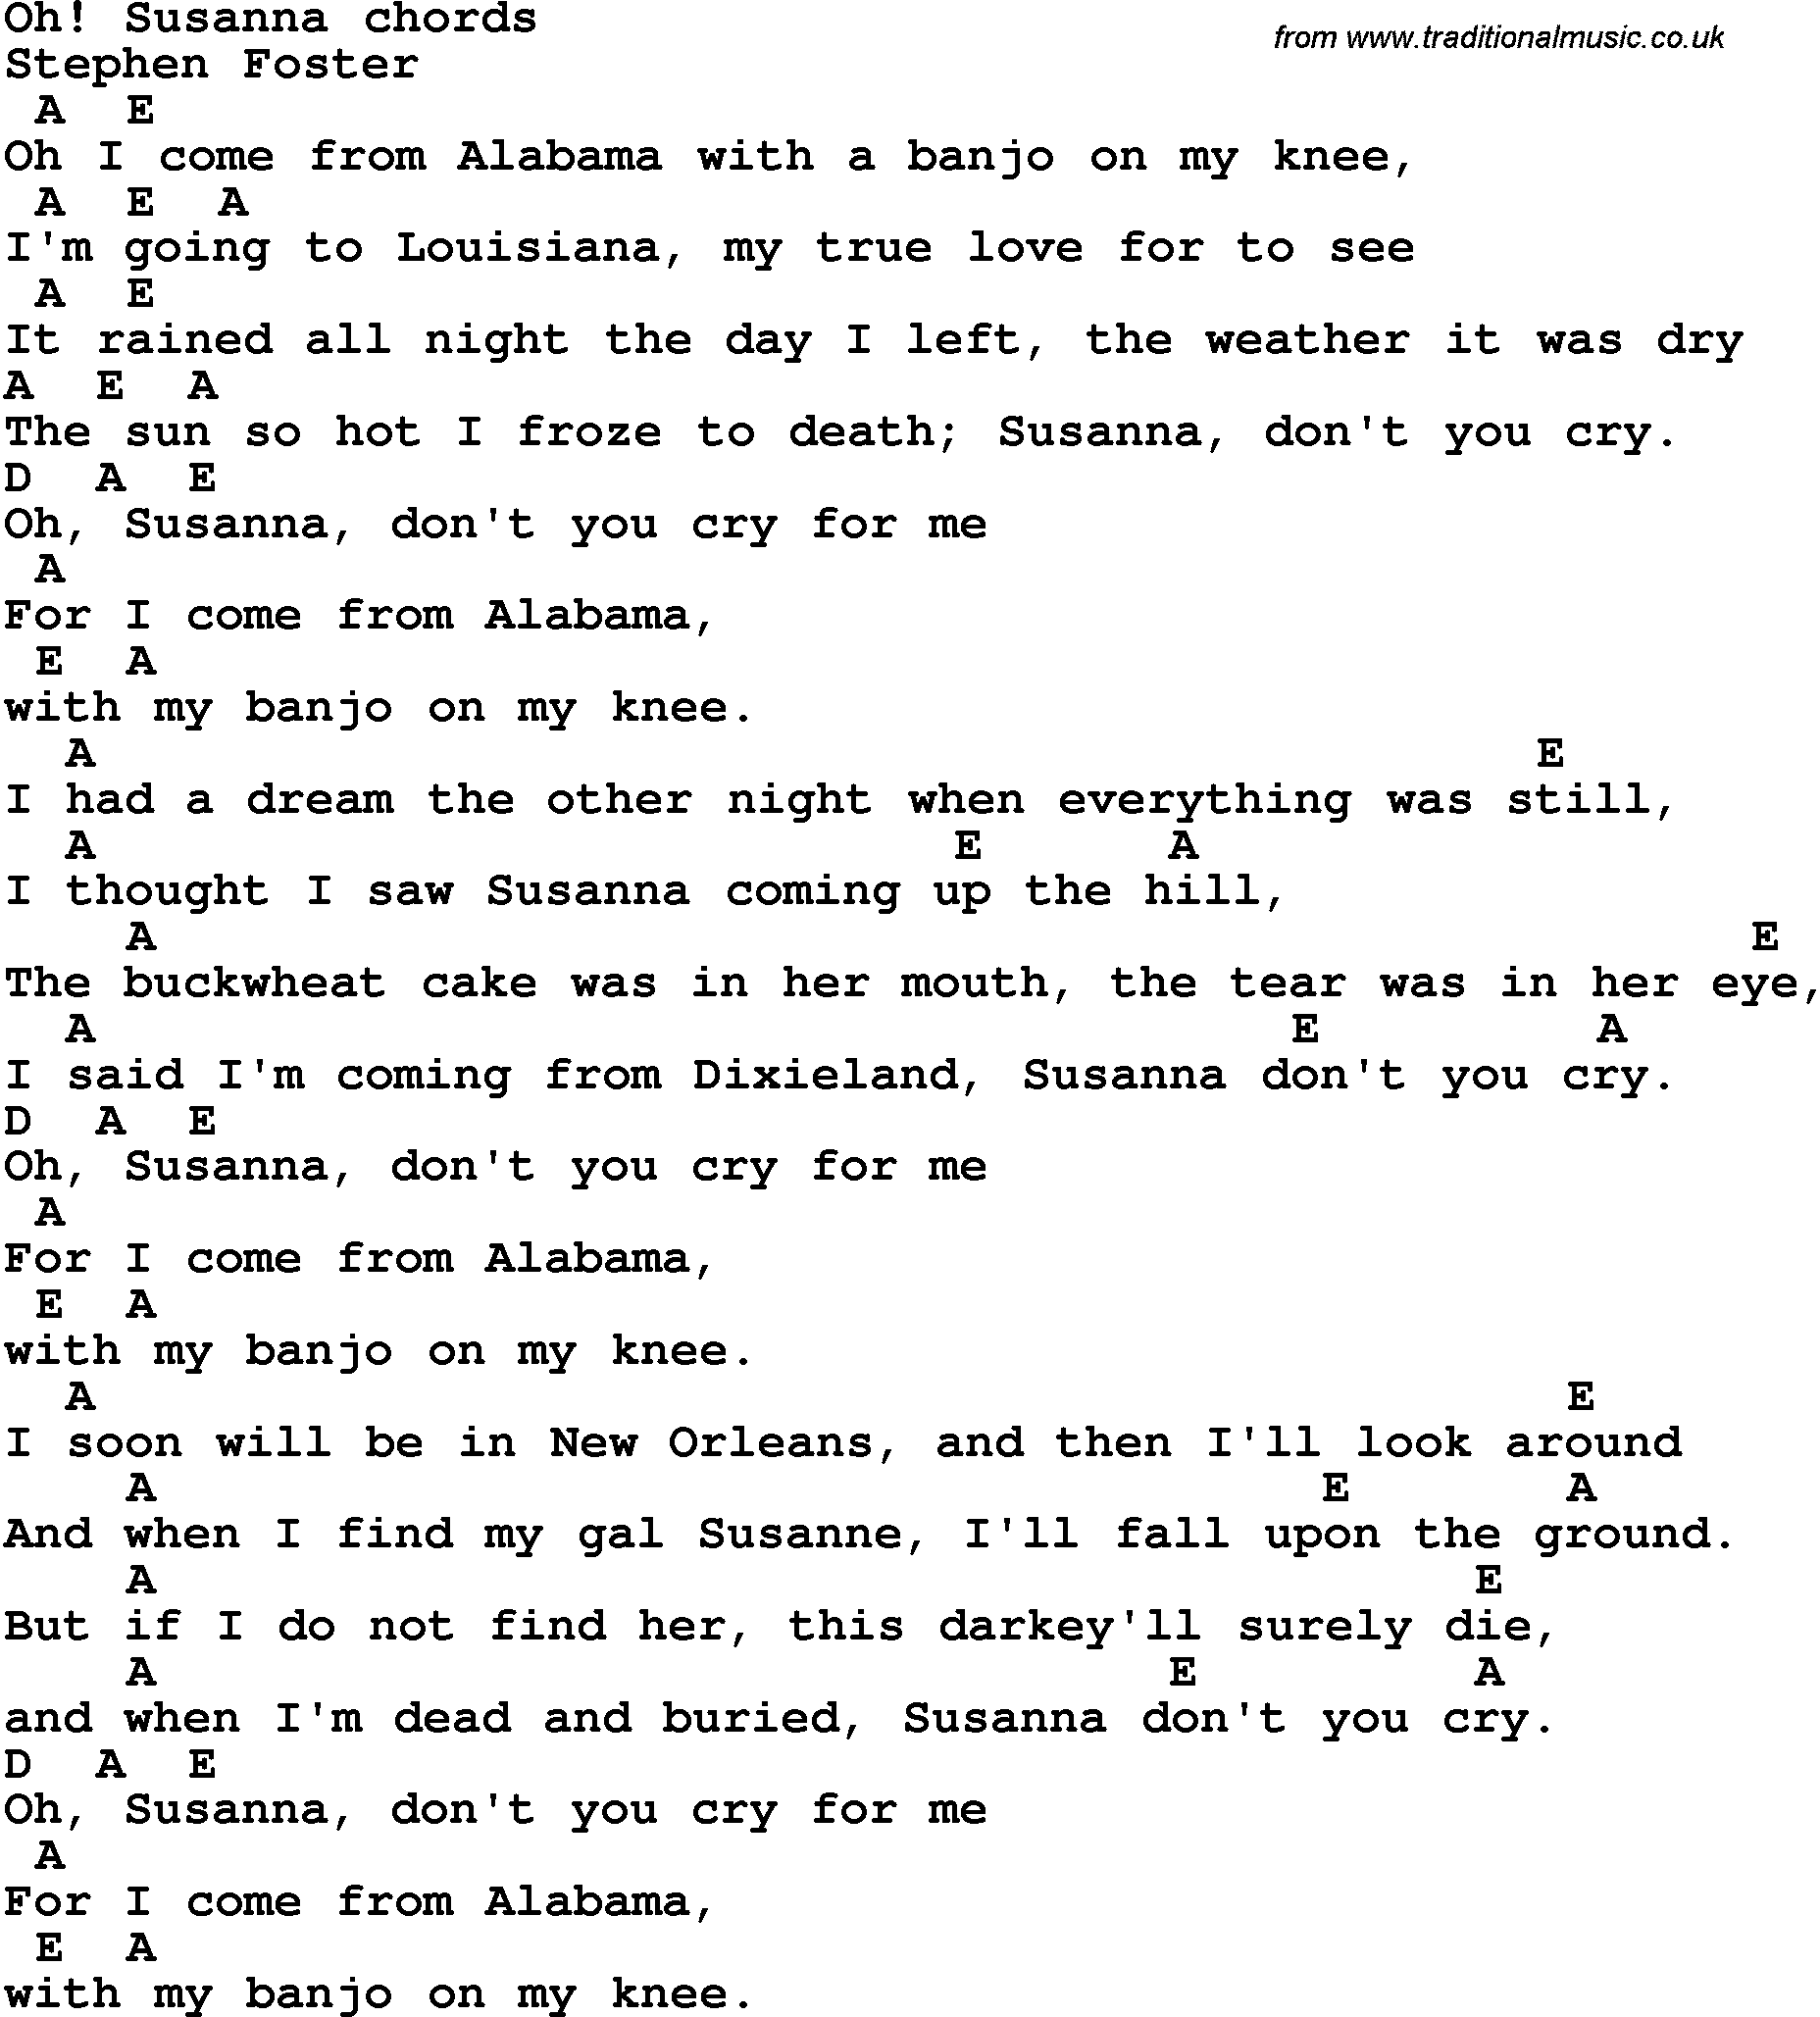 Over The Rainbow Lyrics Sheet Music: Google Image Result For Http://www.traditionalmusic.co.uk